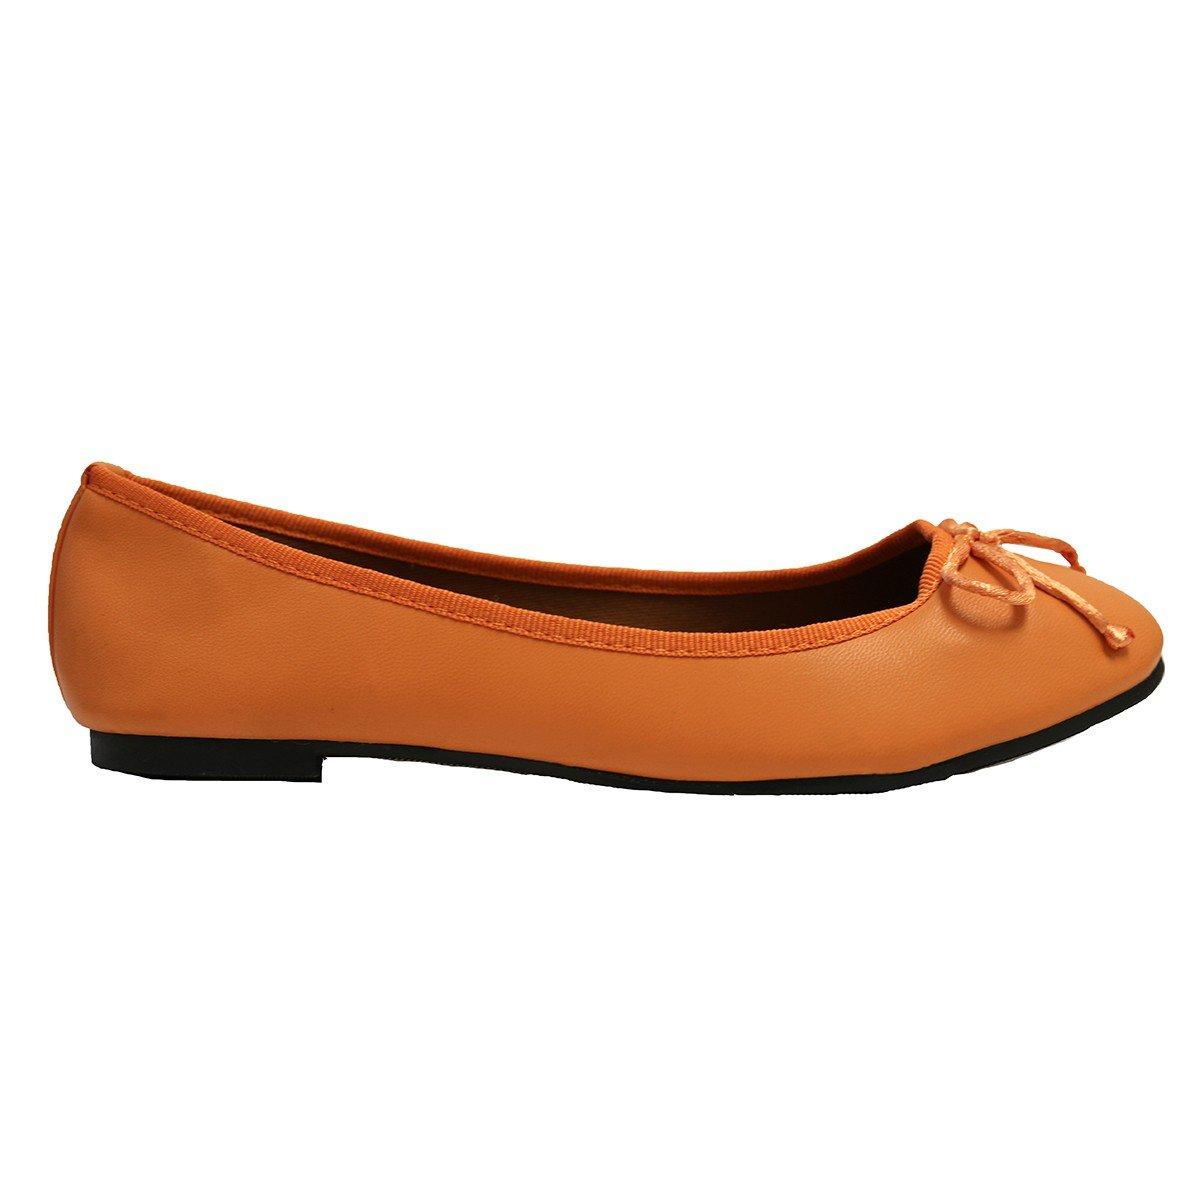 Lily Shoes Ballerines Oranges Avec Petit Noeud j1ovGxYGcY